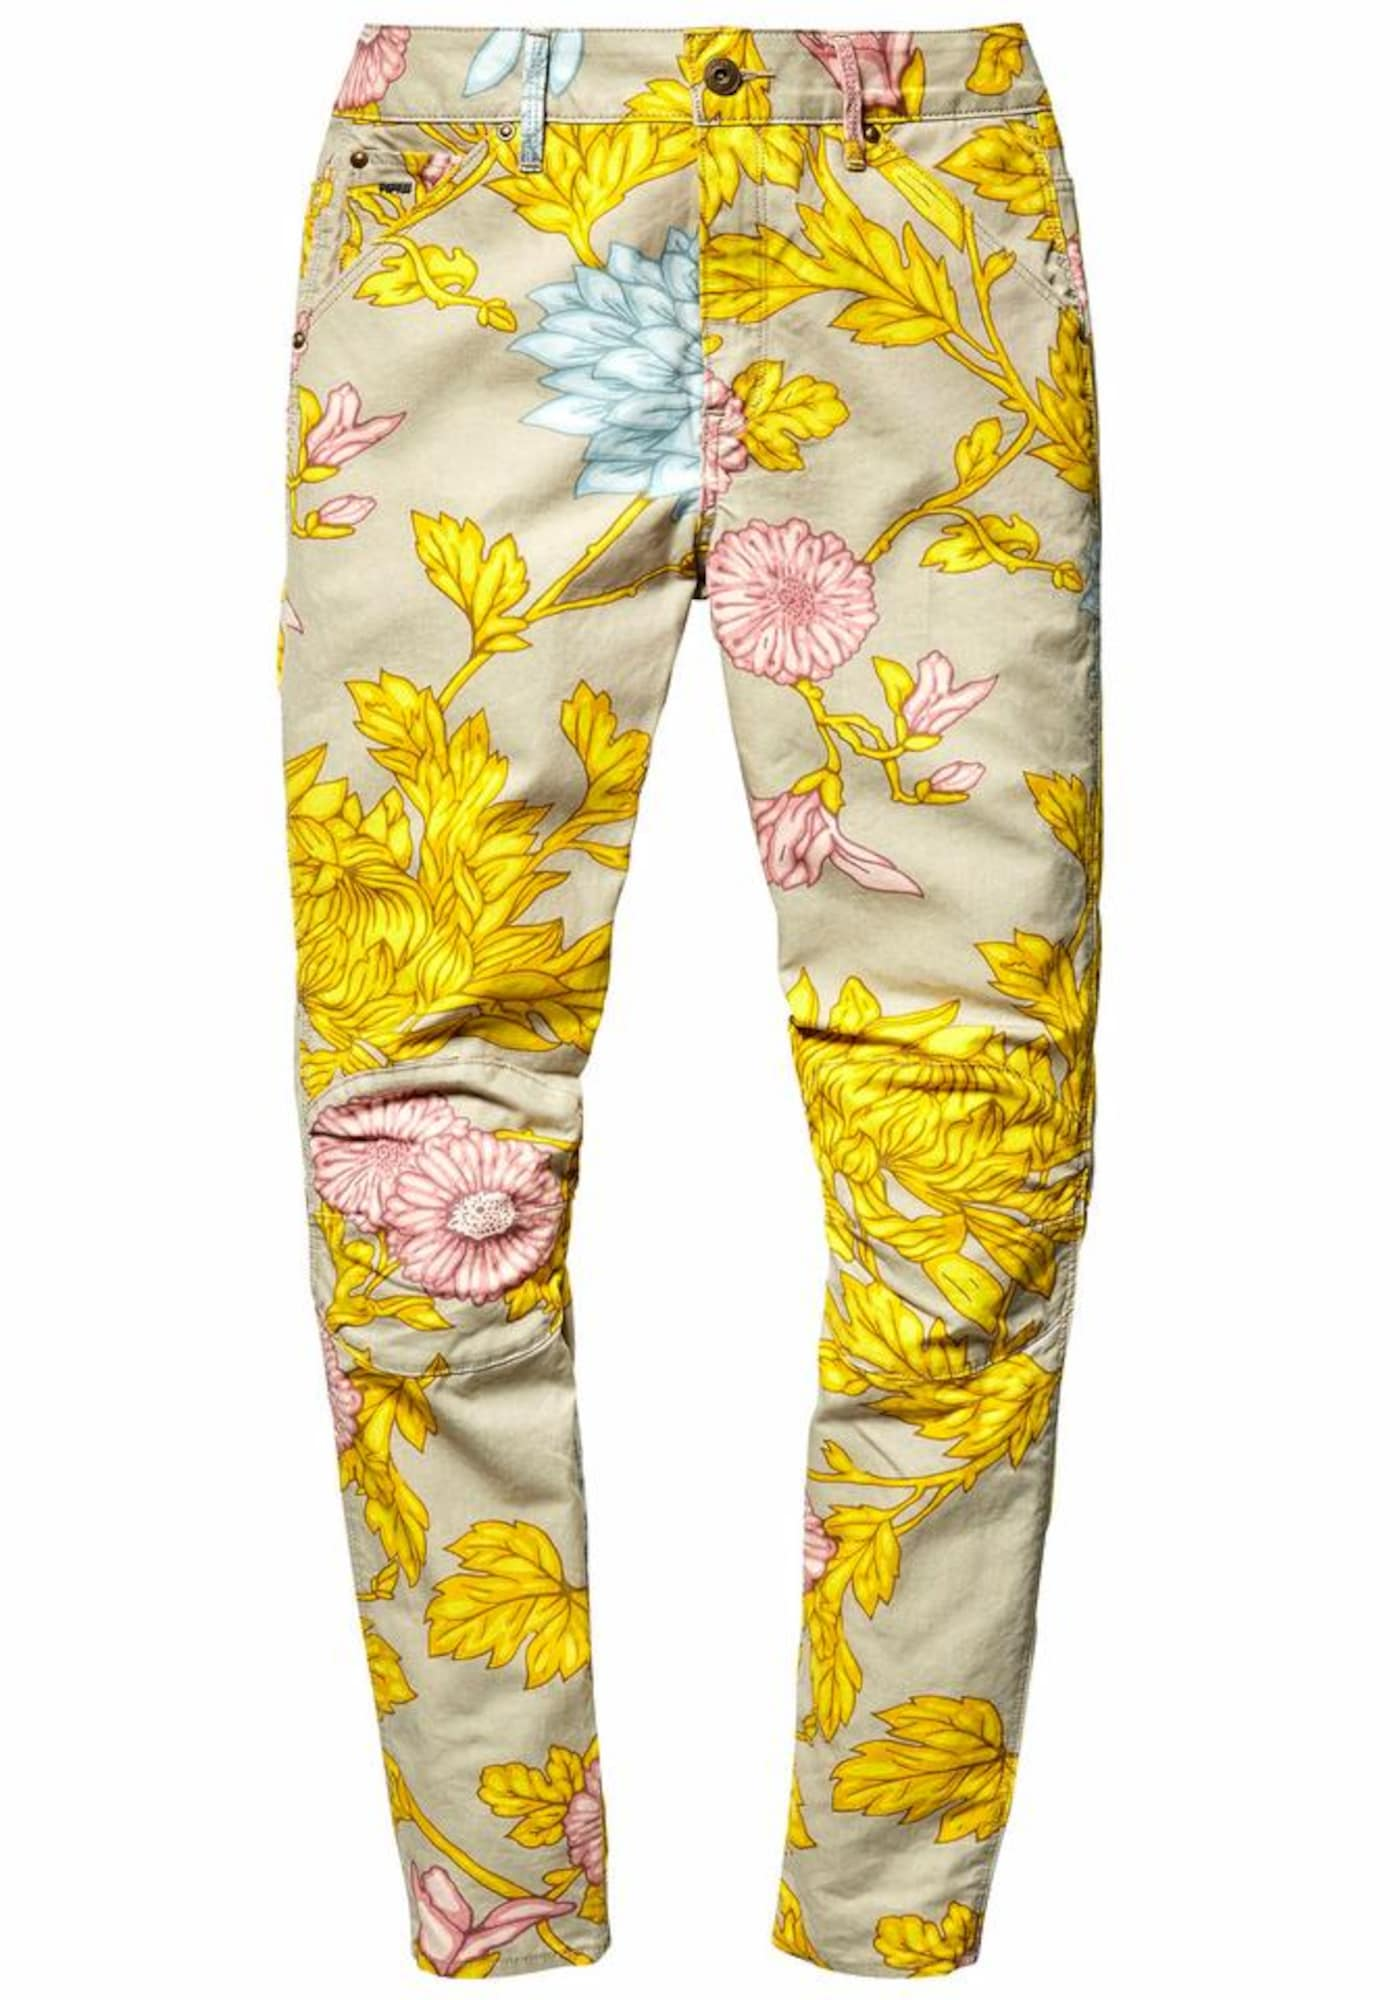 G-STAR RAW Dames Jeans Elwood 5622 3D mid boyfried COJ beige geel